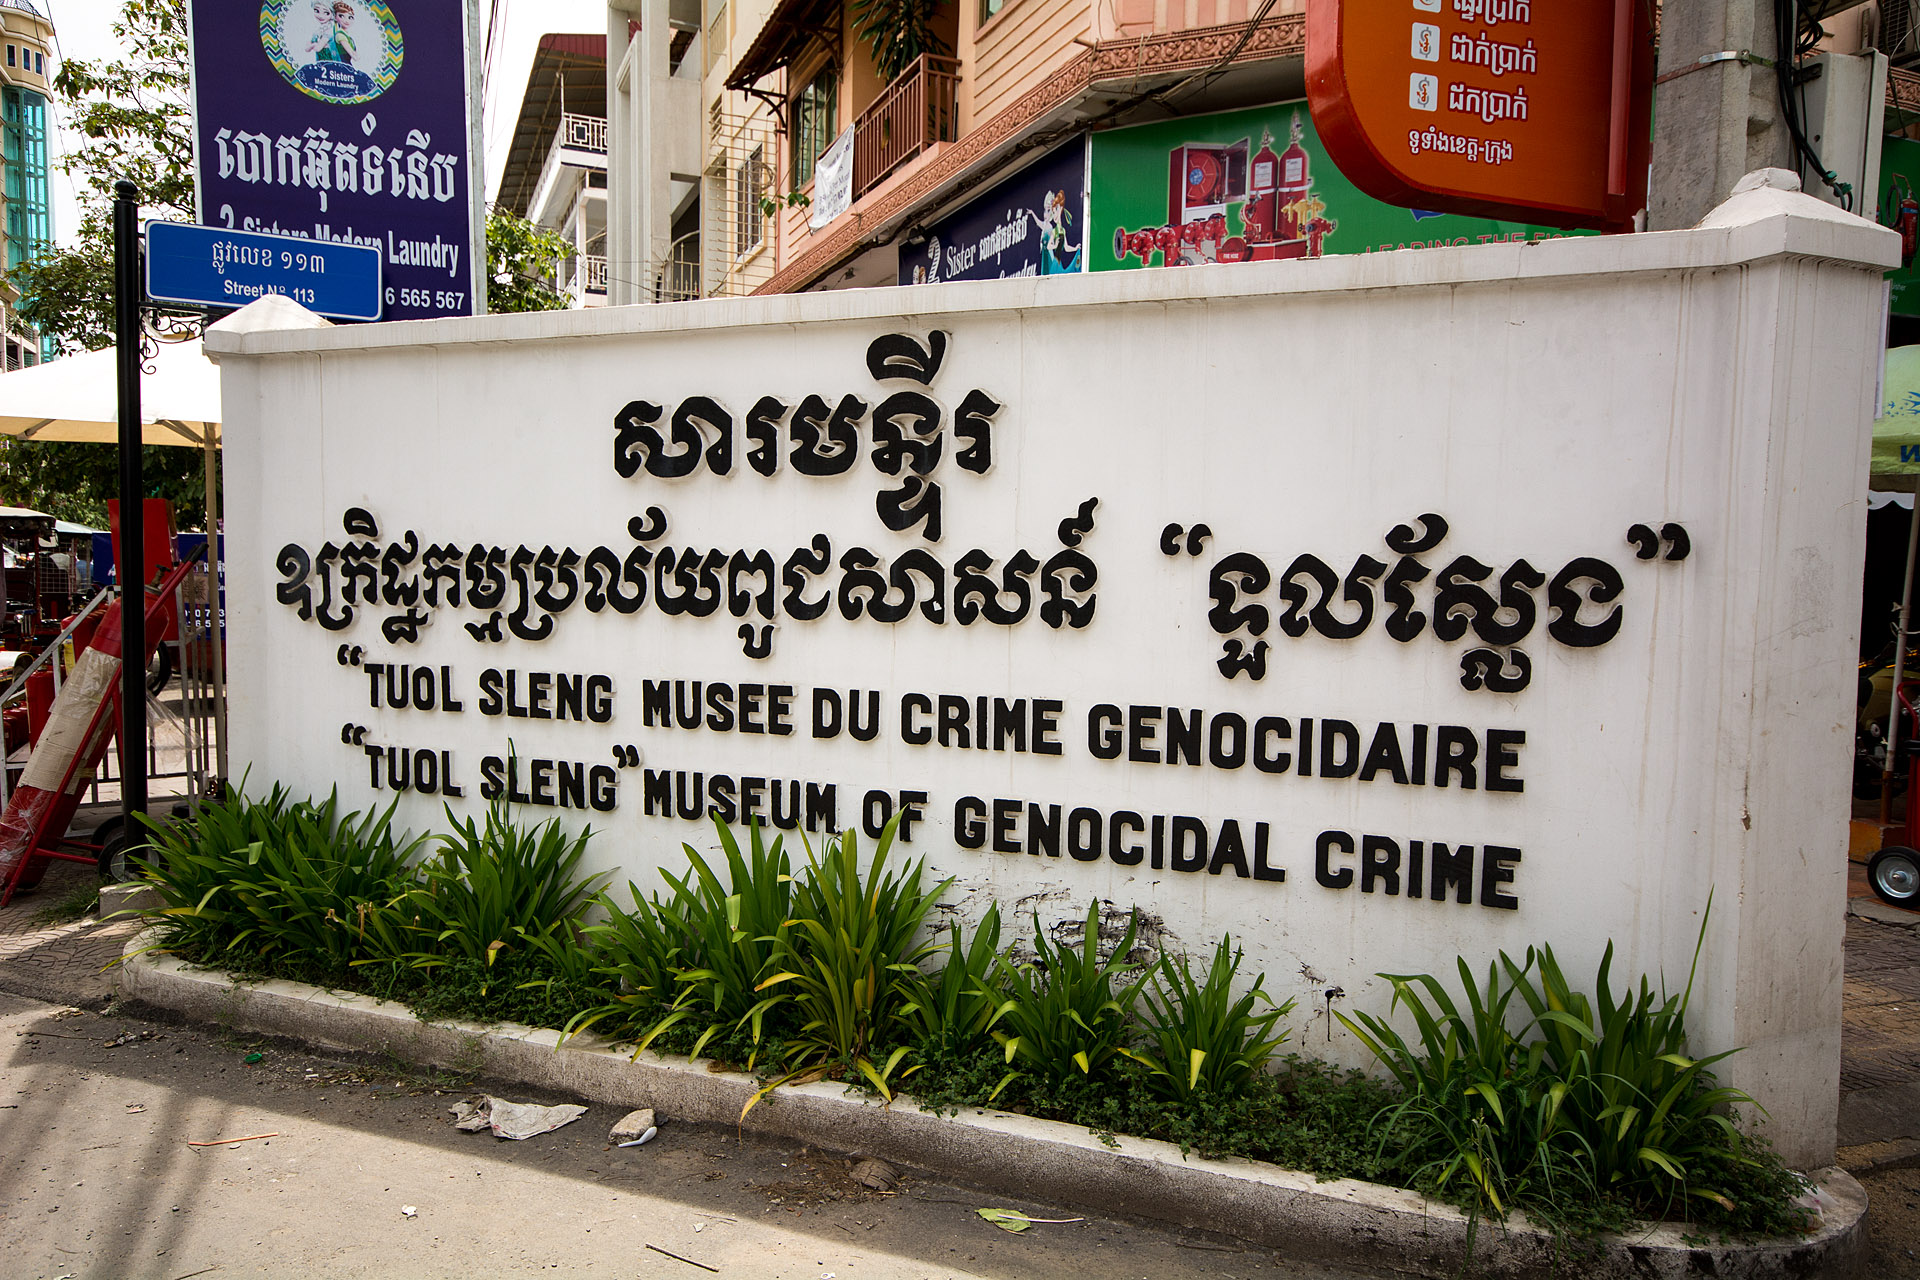 Tuol Sleng (S-21)